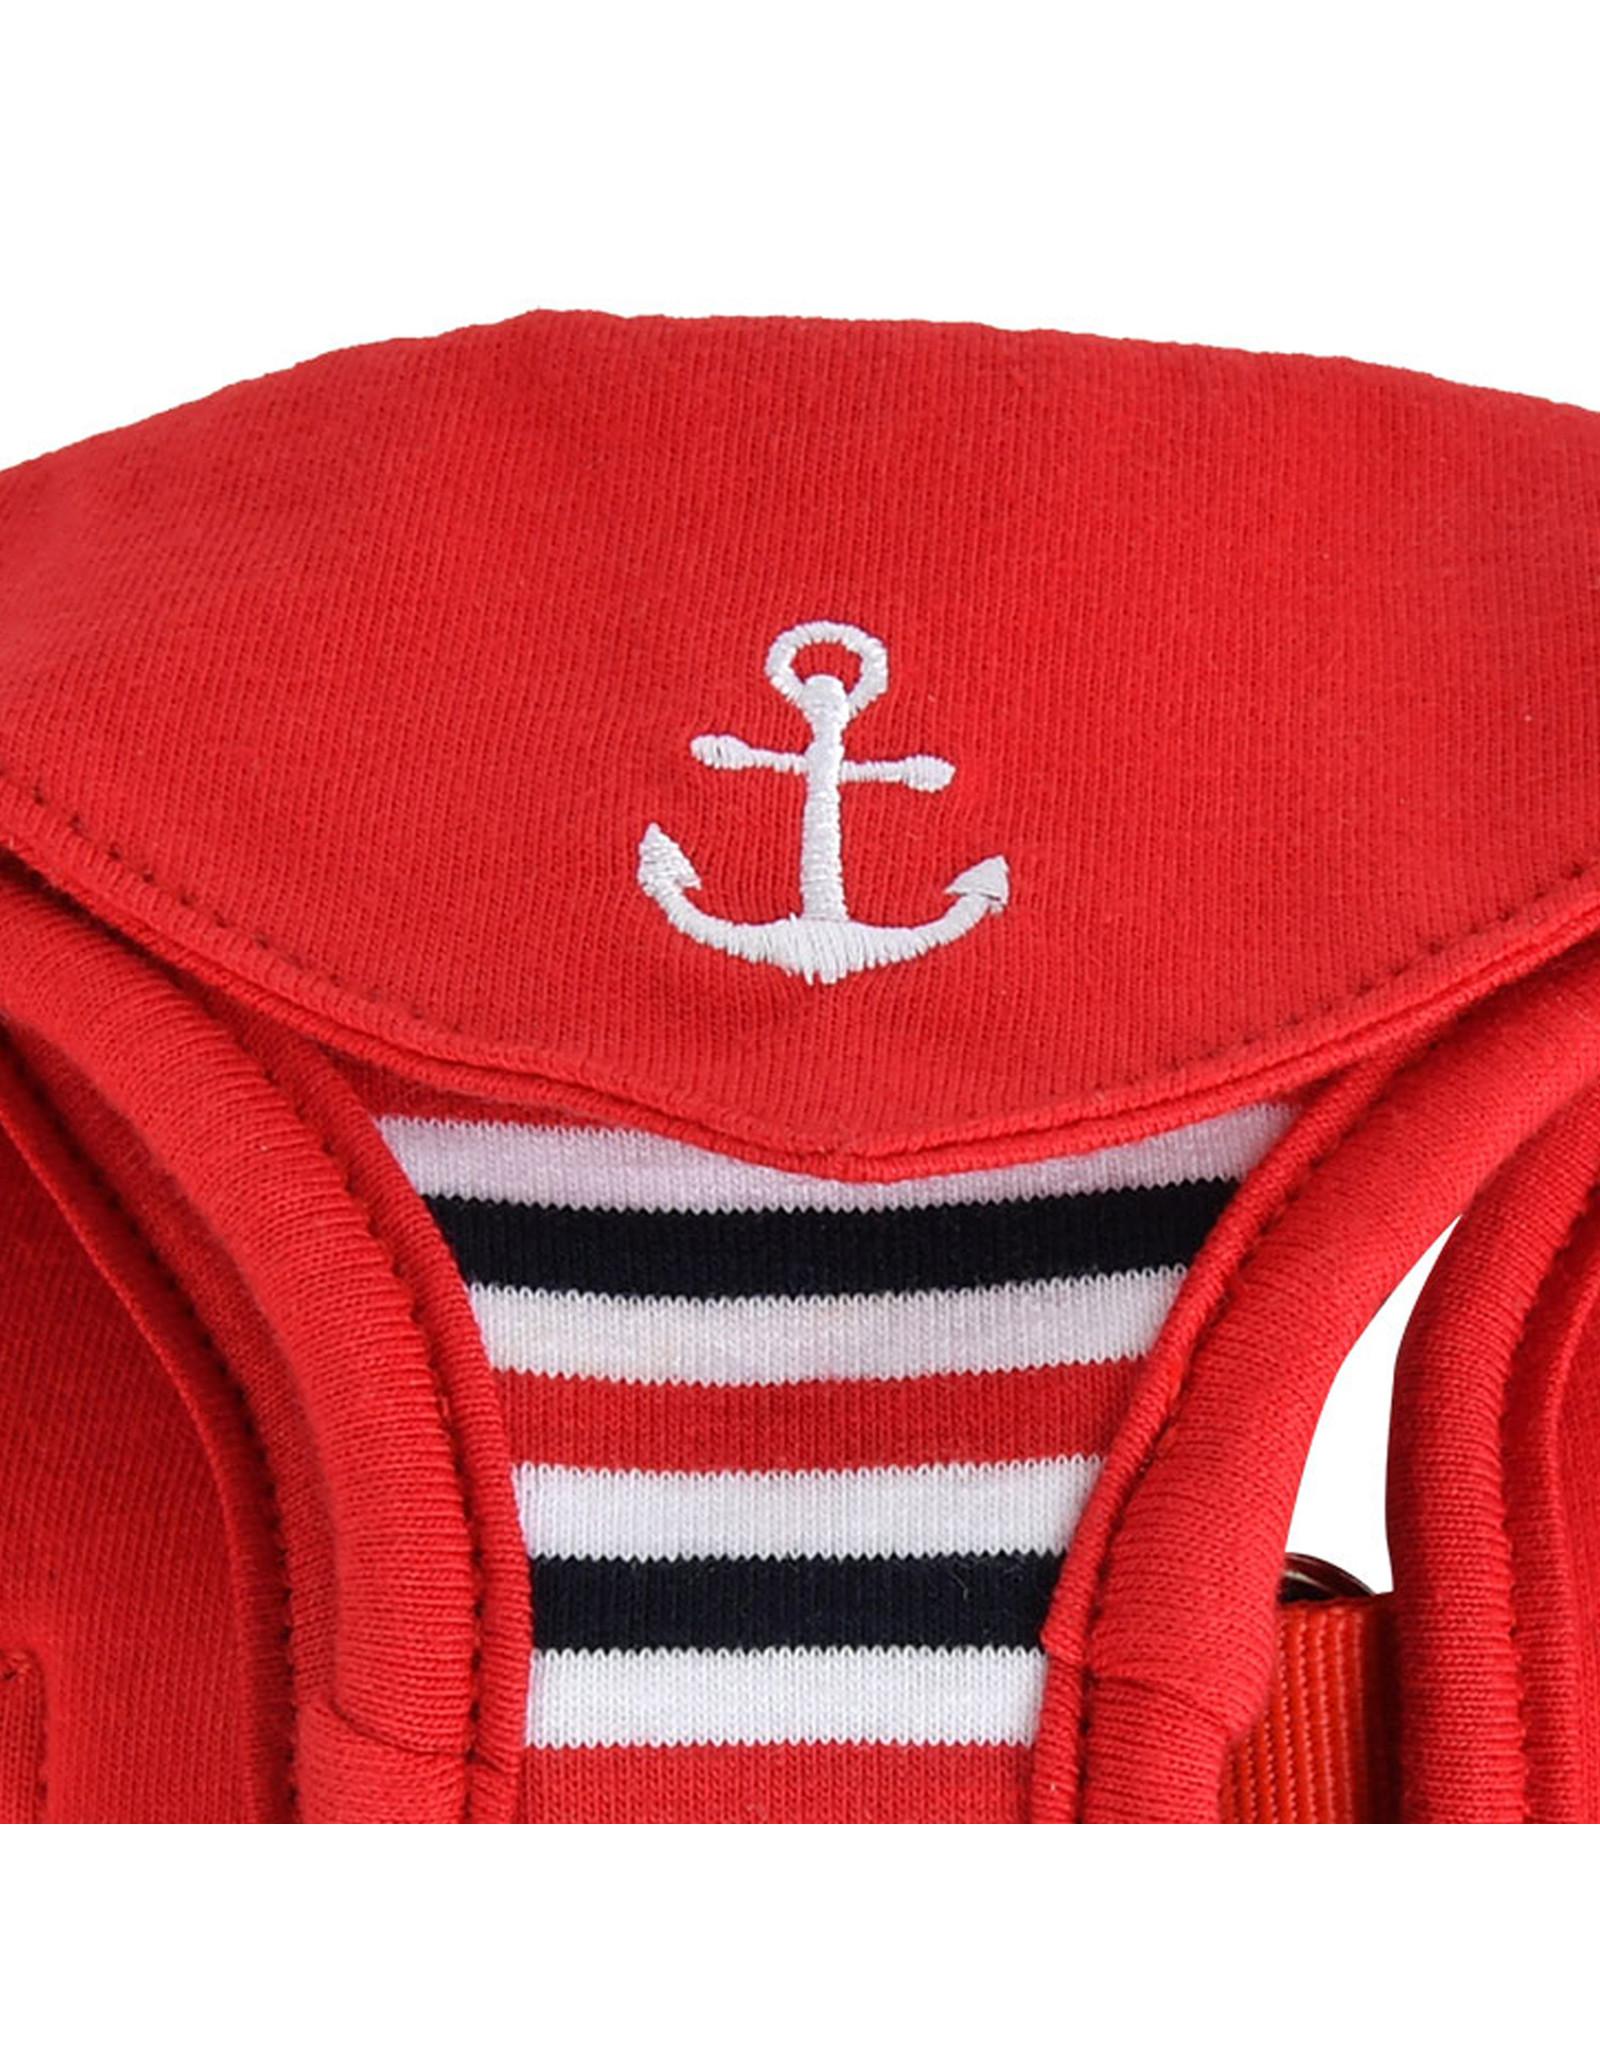 Puppia Puppia Seaman  Harness model B Red